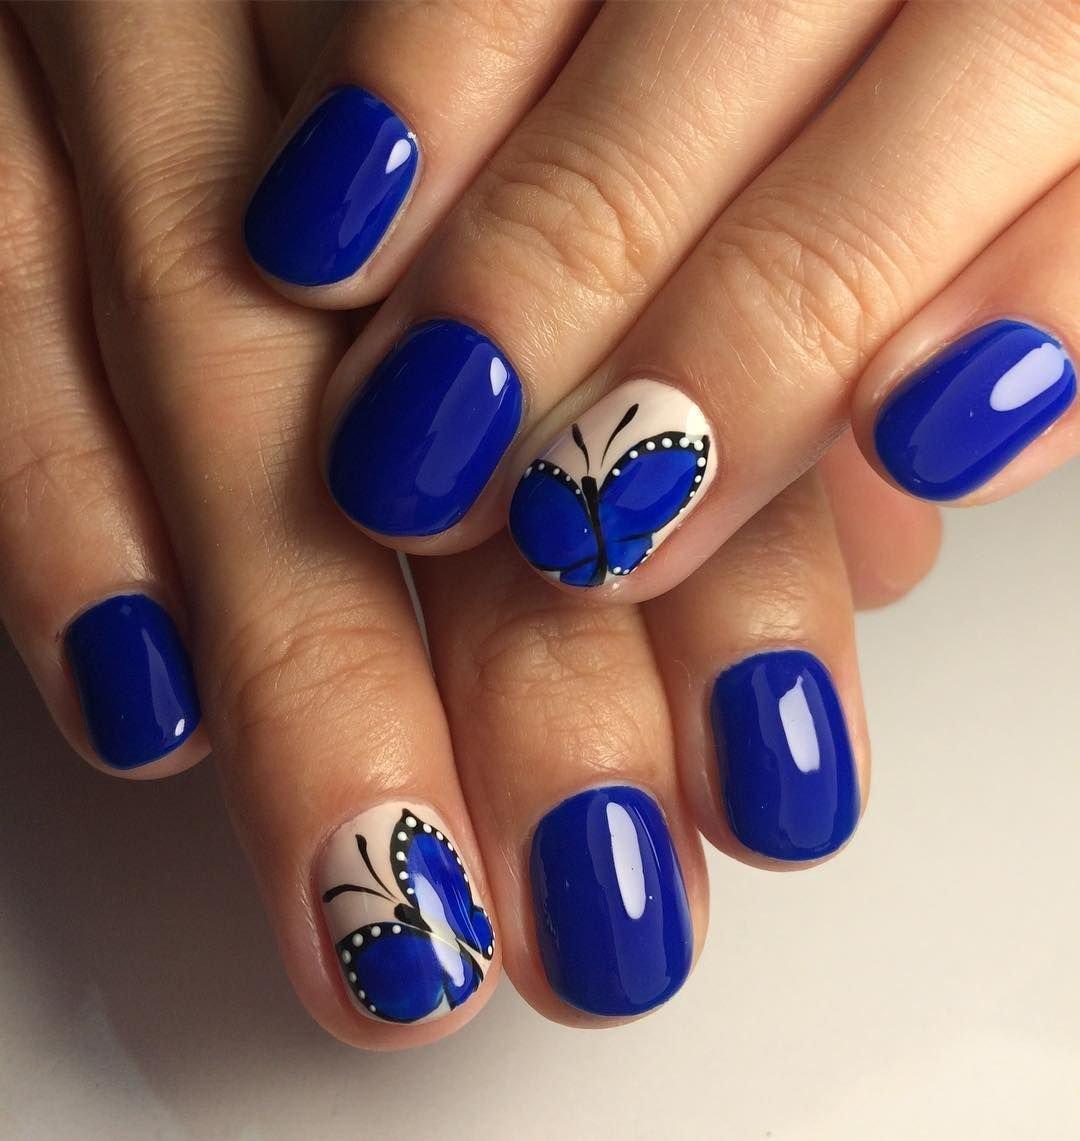 Маникюр дизайн ногтей фото синий